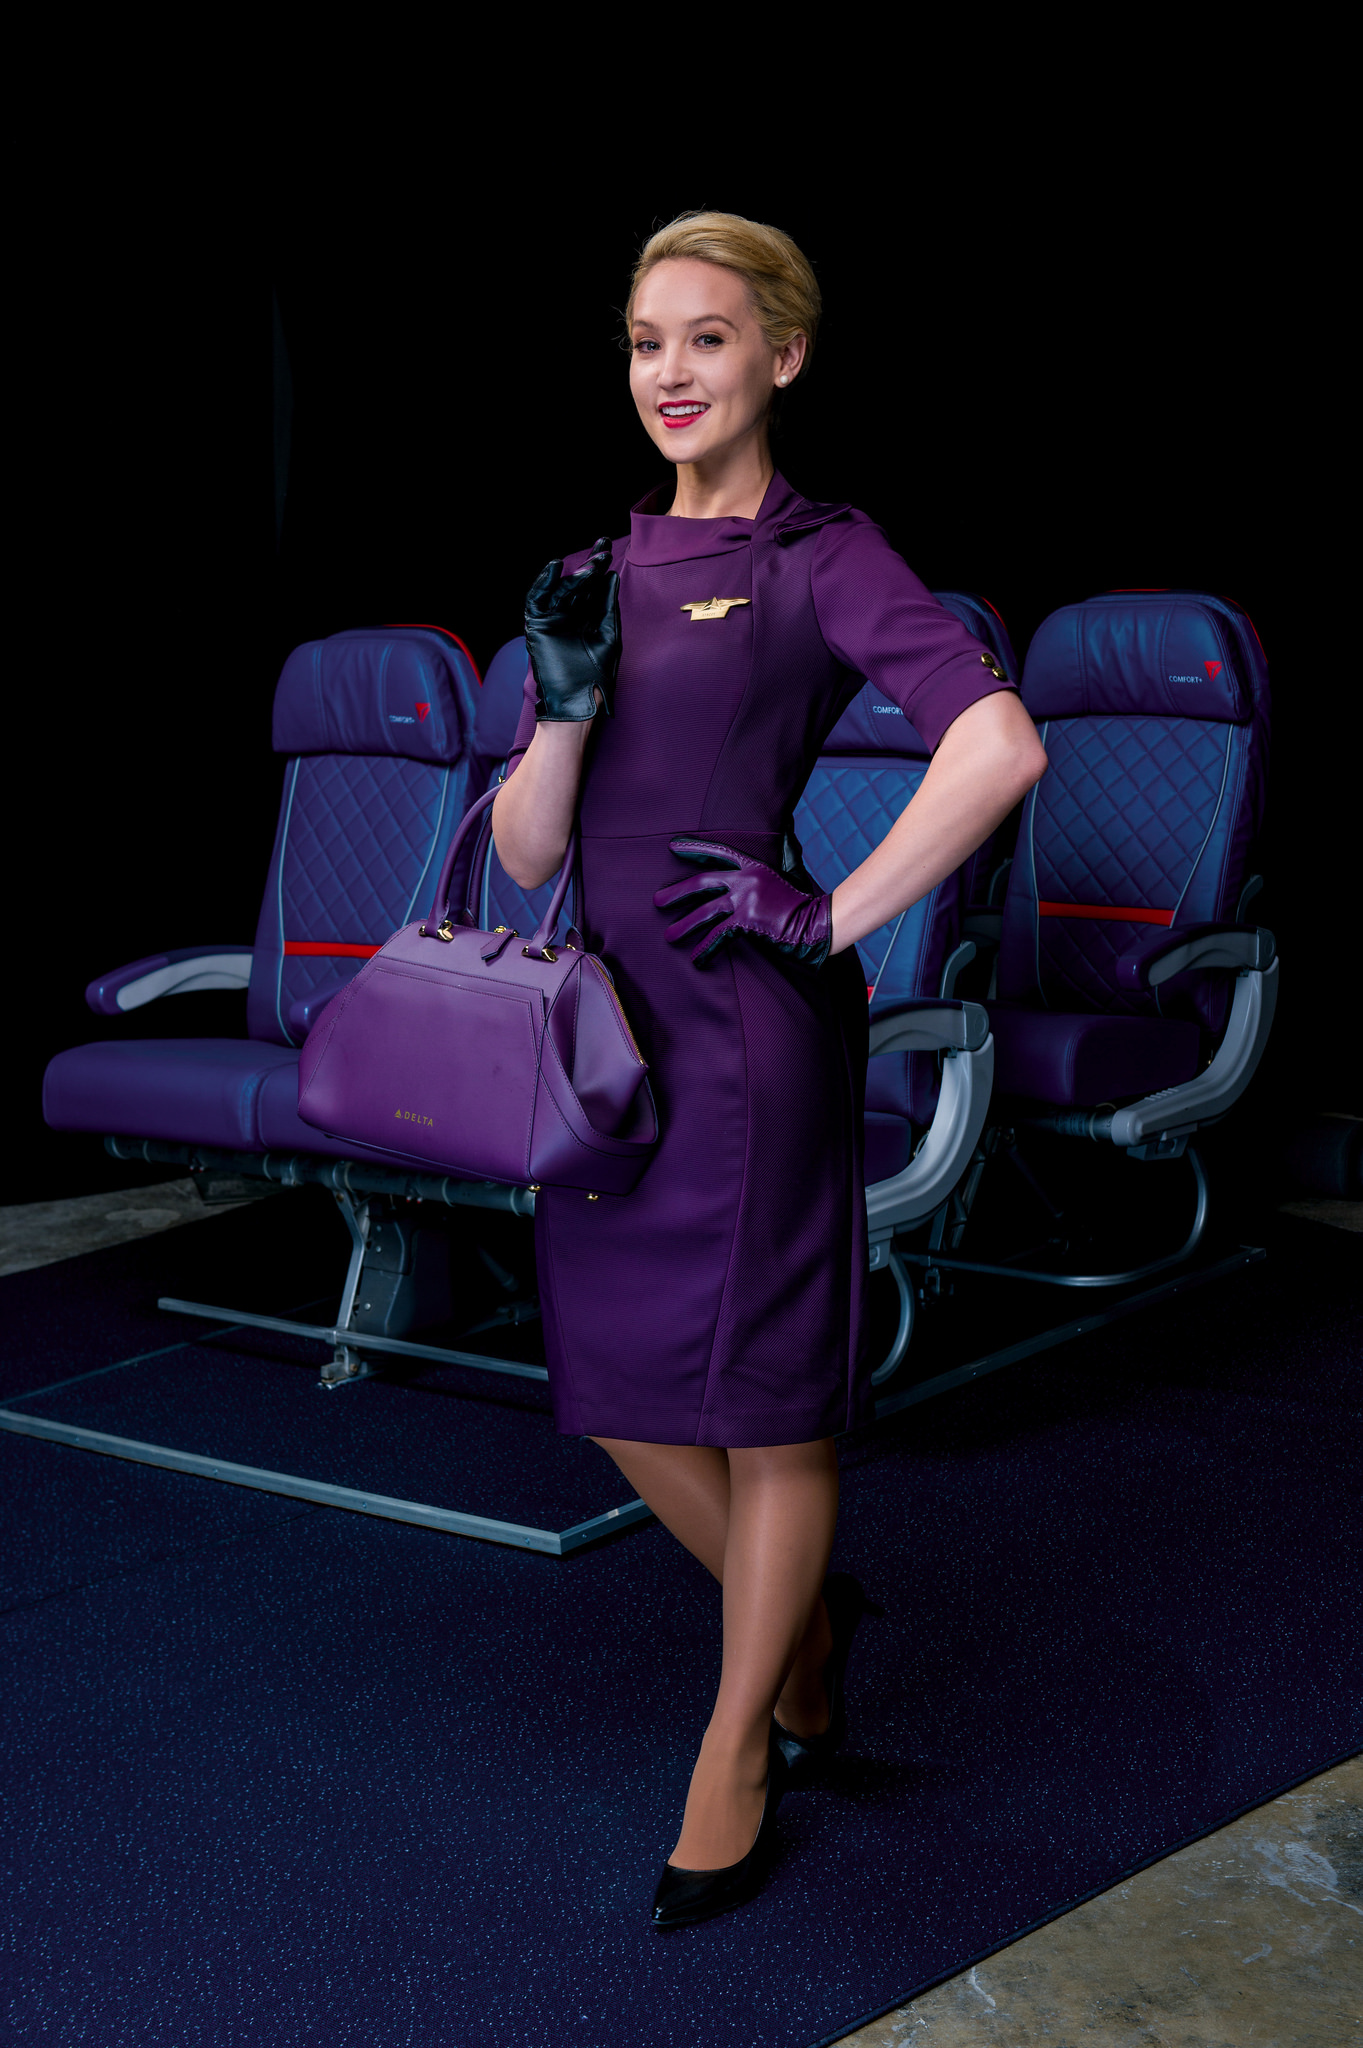 A flight attendant uniform and accessories